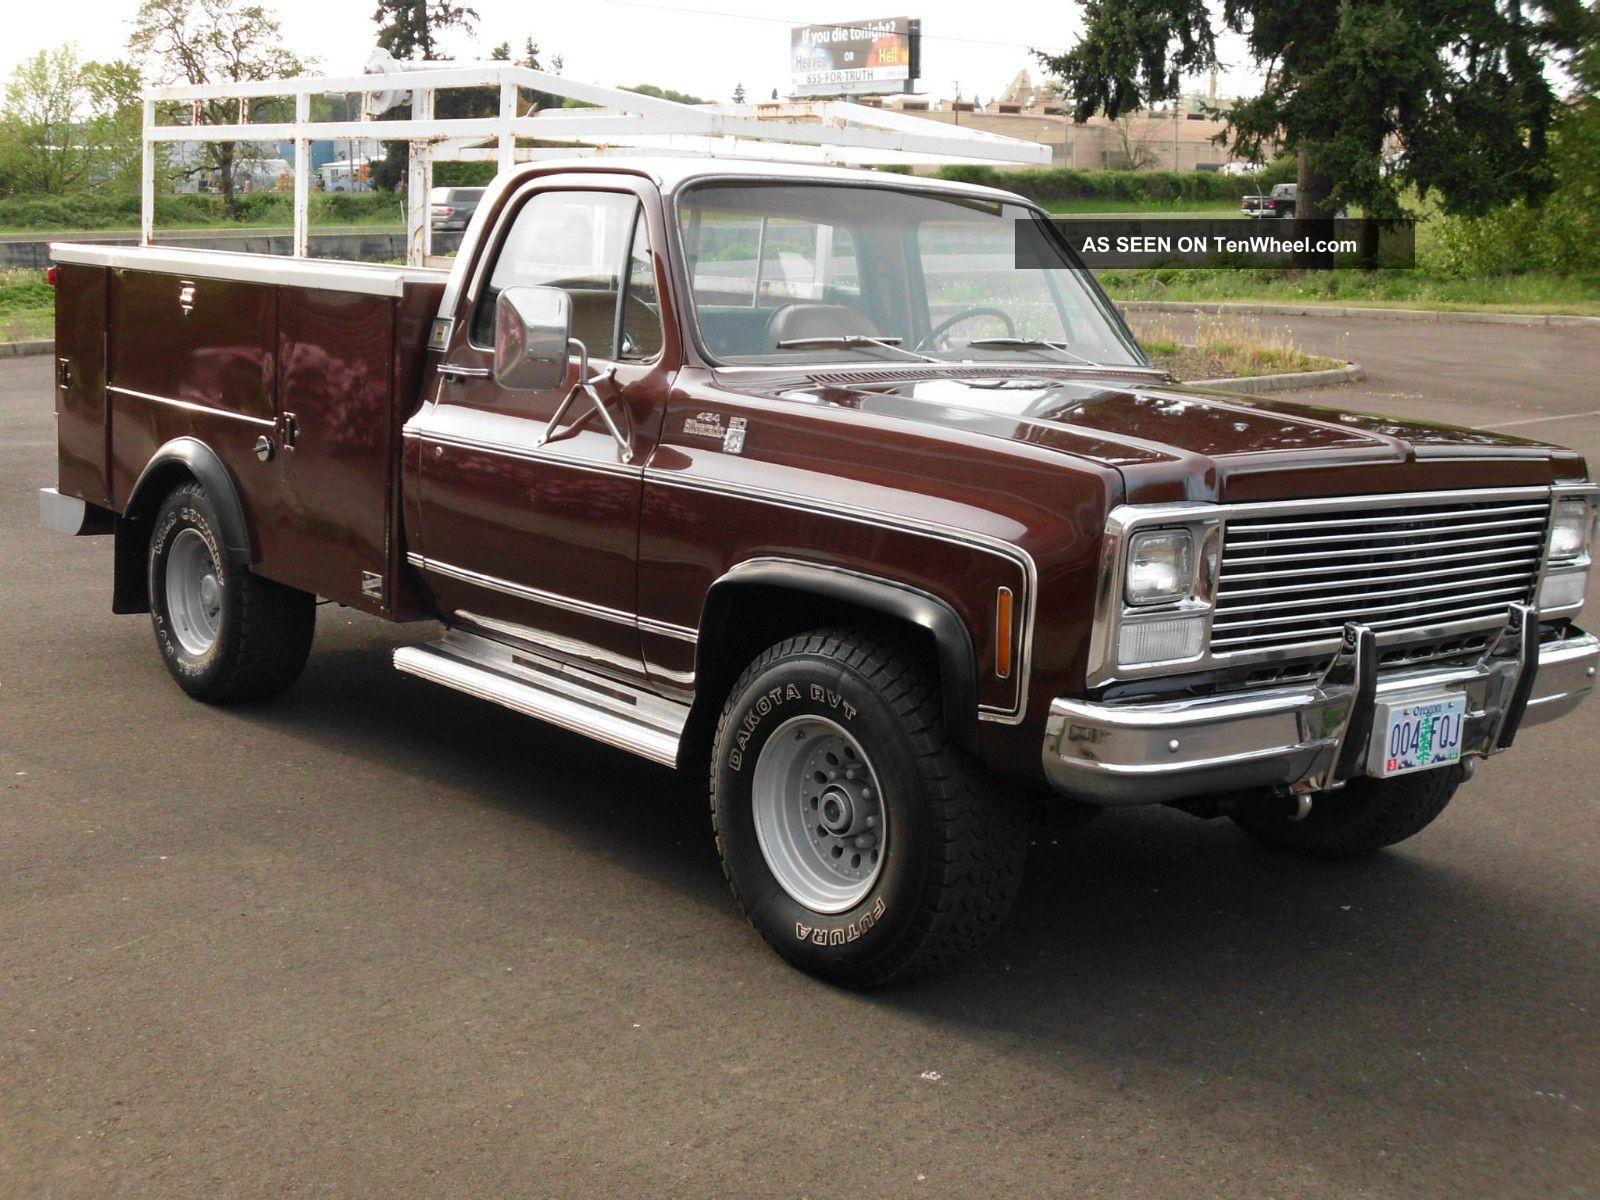 4x4 chevrolet 1963 chevrolet custom 4x4 pickup 158330 chevrolet chevy pick up truck 4x4 1978. Black Bedroom Furniture Sets. Home Design Ideas